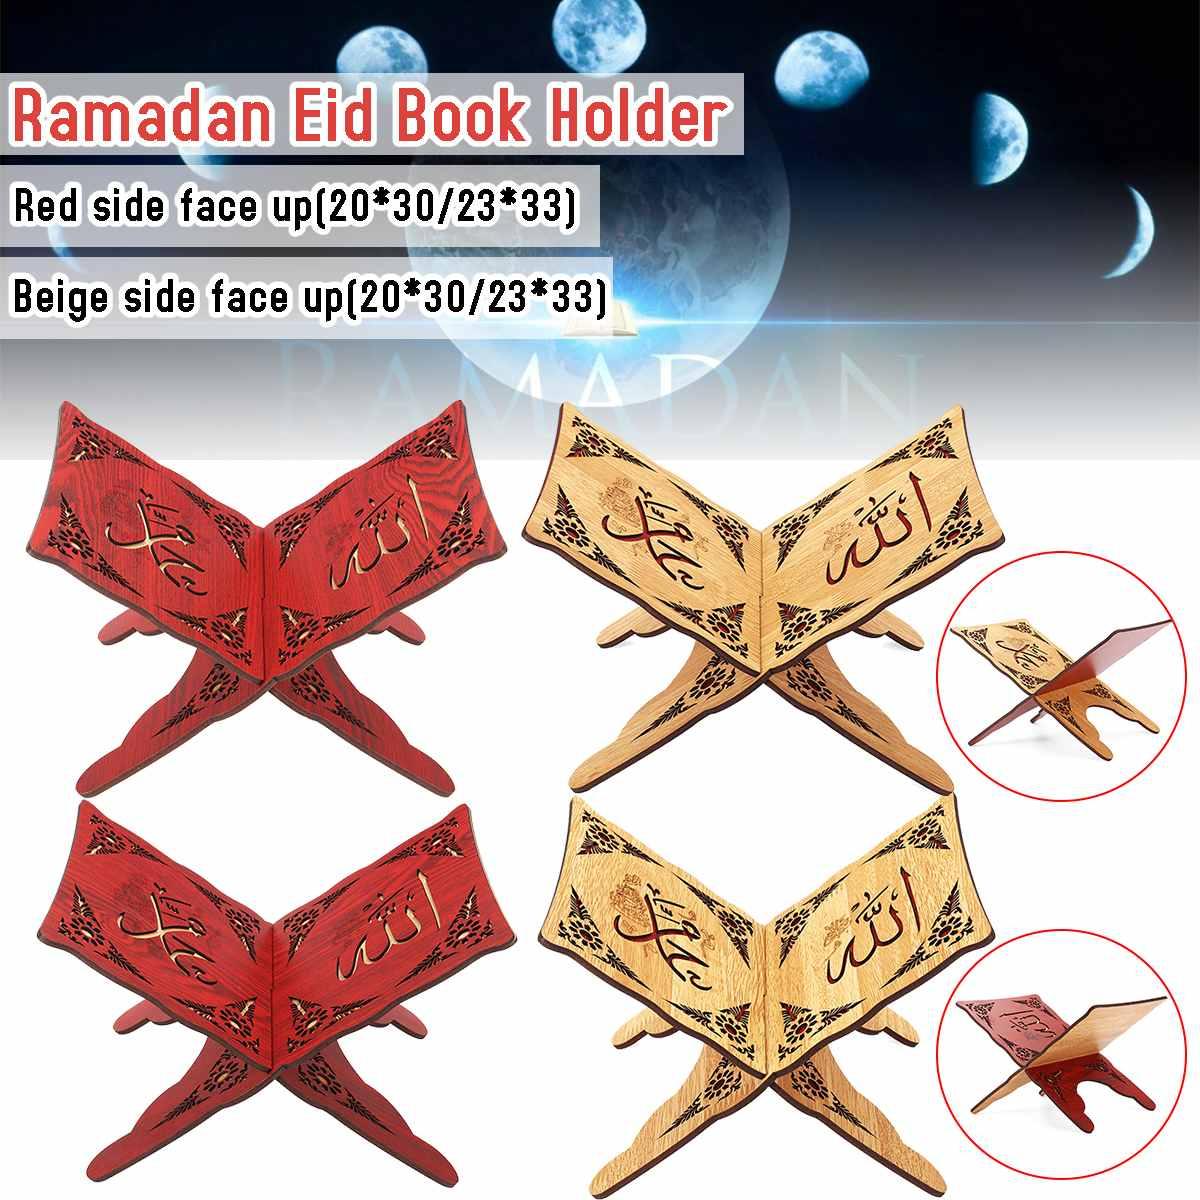 20x30/23x33cm Stand Holder Storage Ramadan Eid Wooden Bookshelf Book Library Shelf For Islamic Prayer Arts Crafts Reading Frame20x30/23x33cm Stand Holder Storage Ramadan Eid Wooden Bookshelf Book Library Shelf For Islamic Prayer Arts Crafts Reading Frame